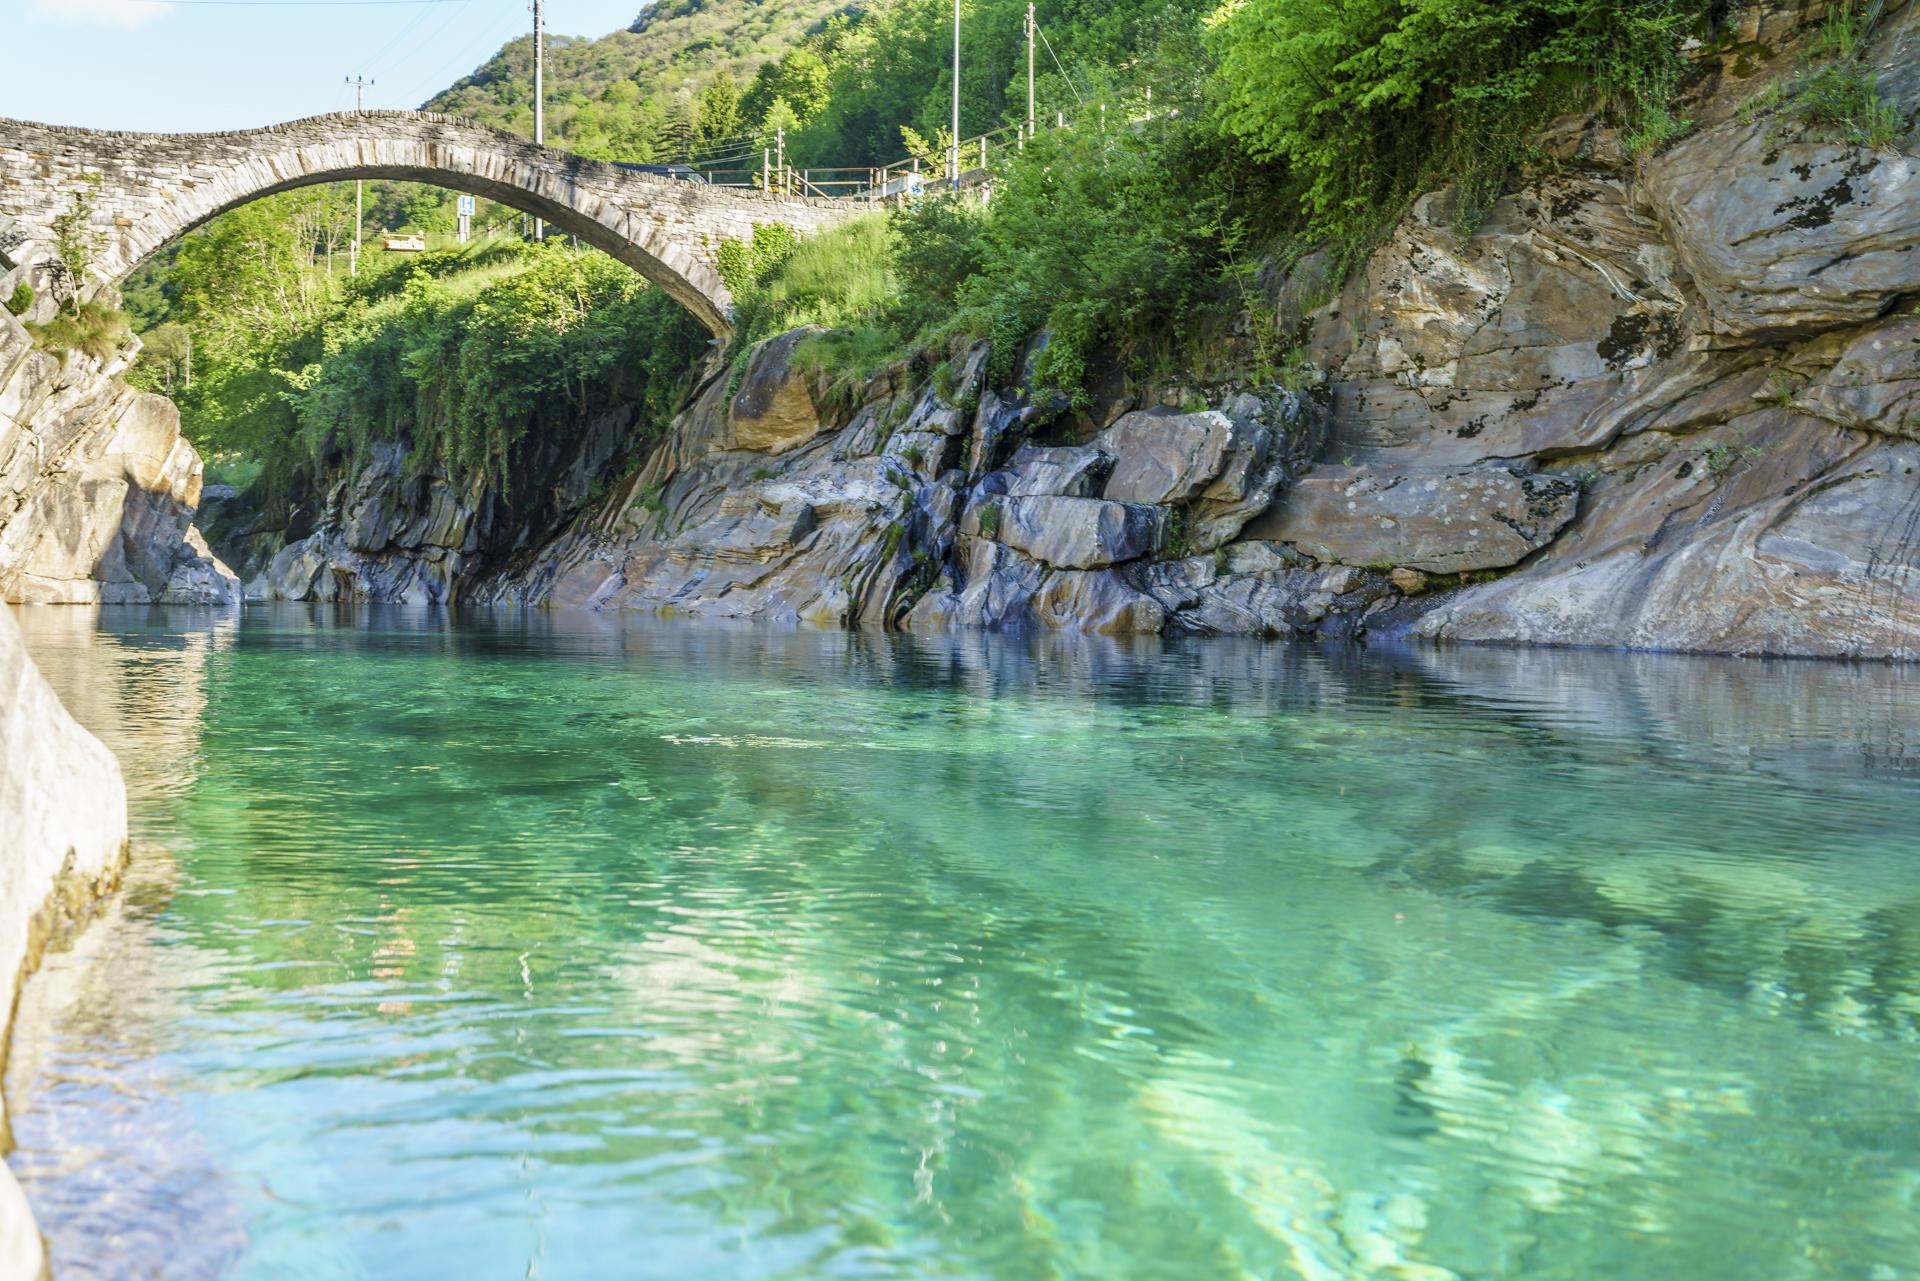 Ponte-Dei-Salti-Val-Verzsaca